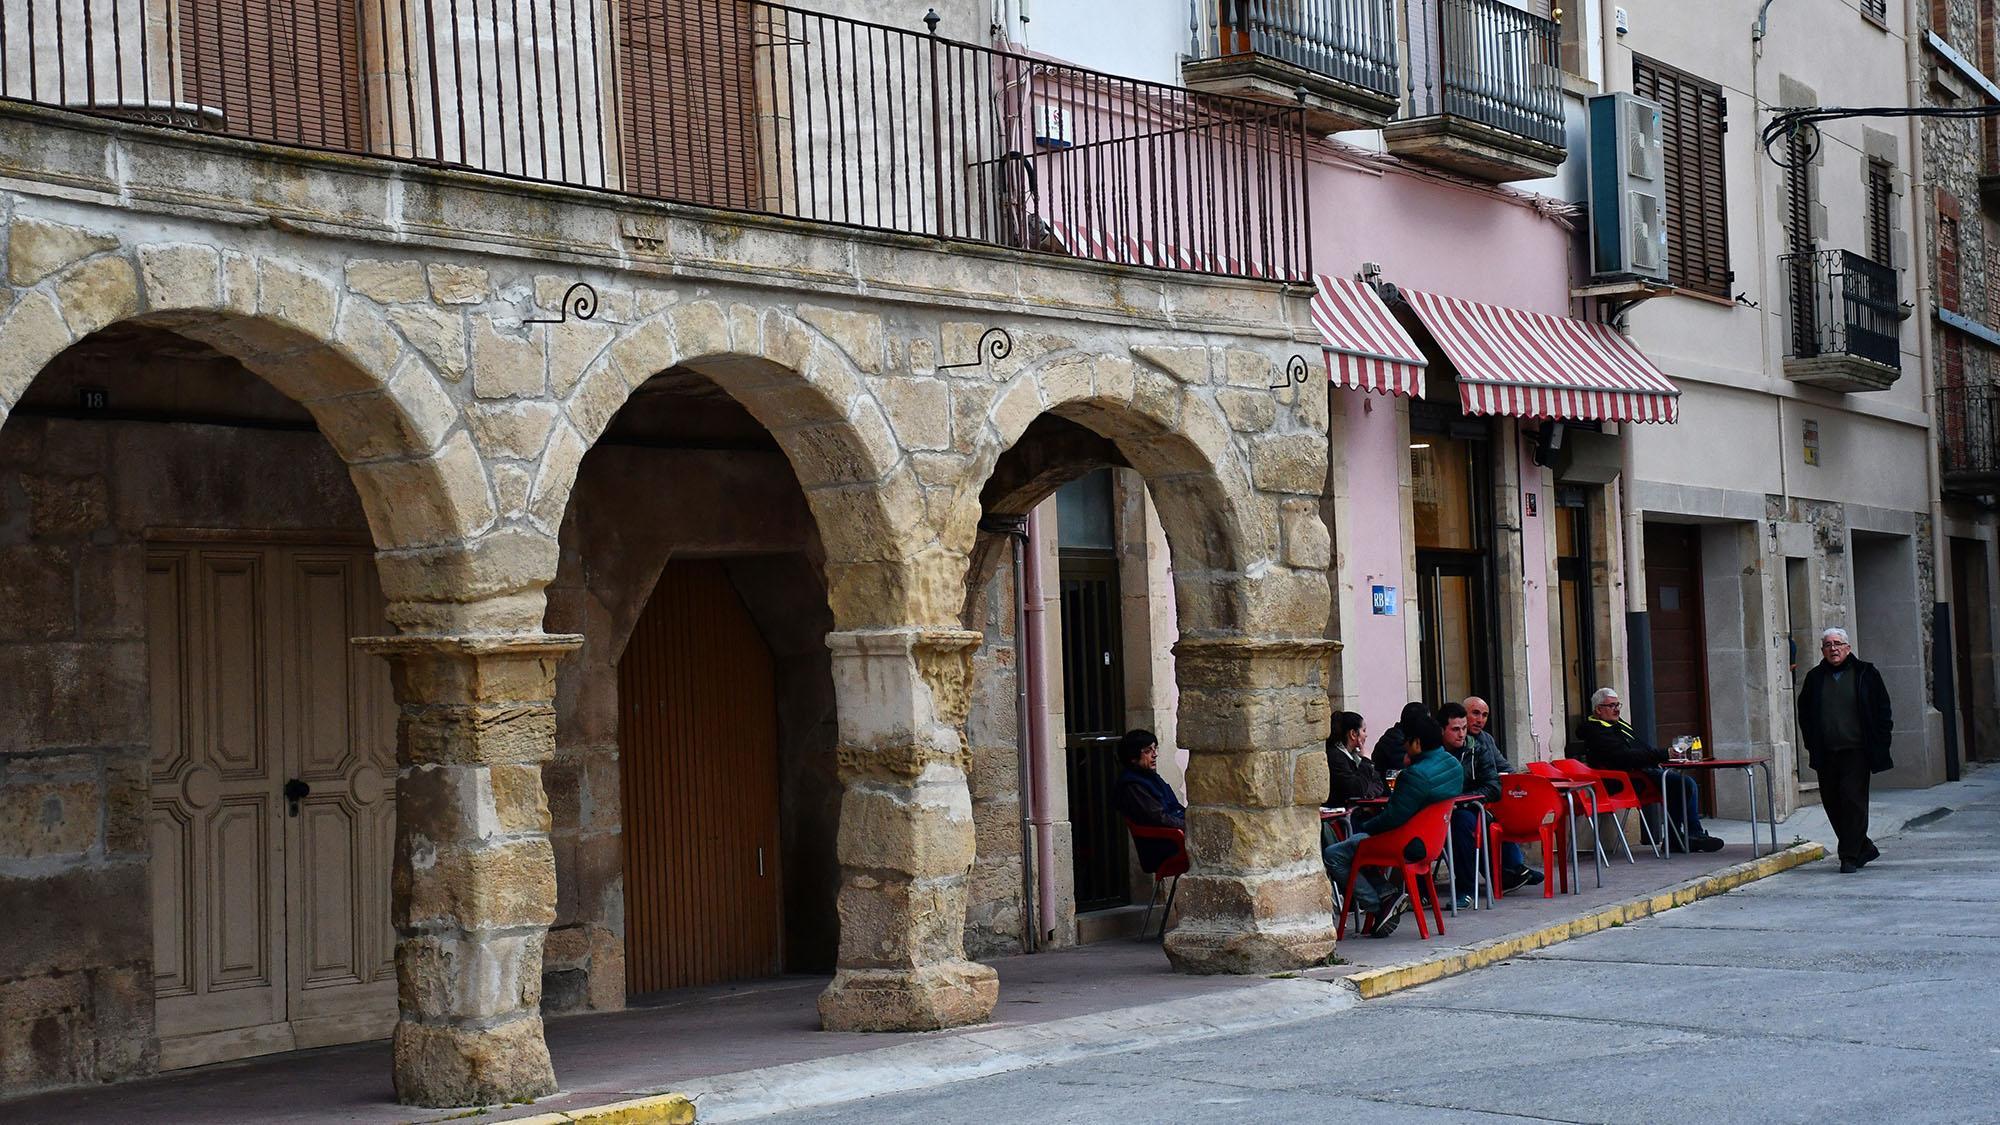 Building Cal Gabarró